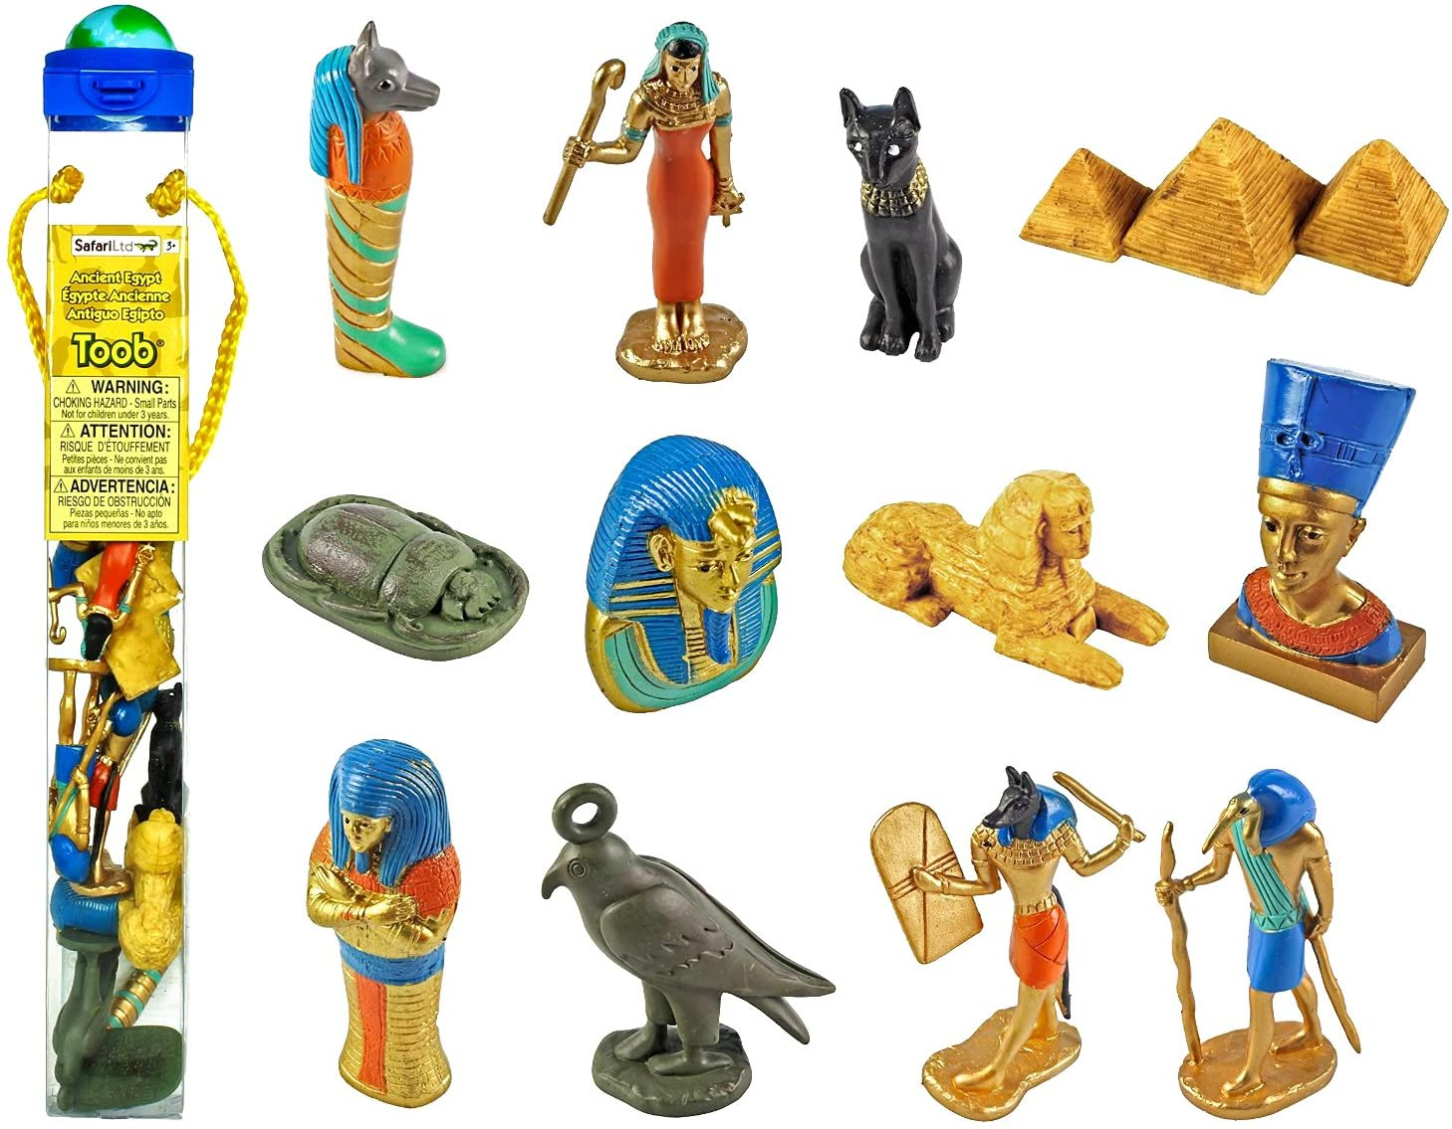 Safari Ltd. Toob 699304 - Antiguo Egipto, figuras coleccionables pintadas a mano